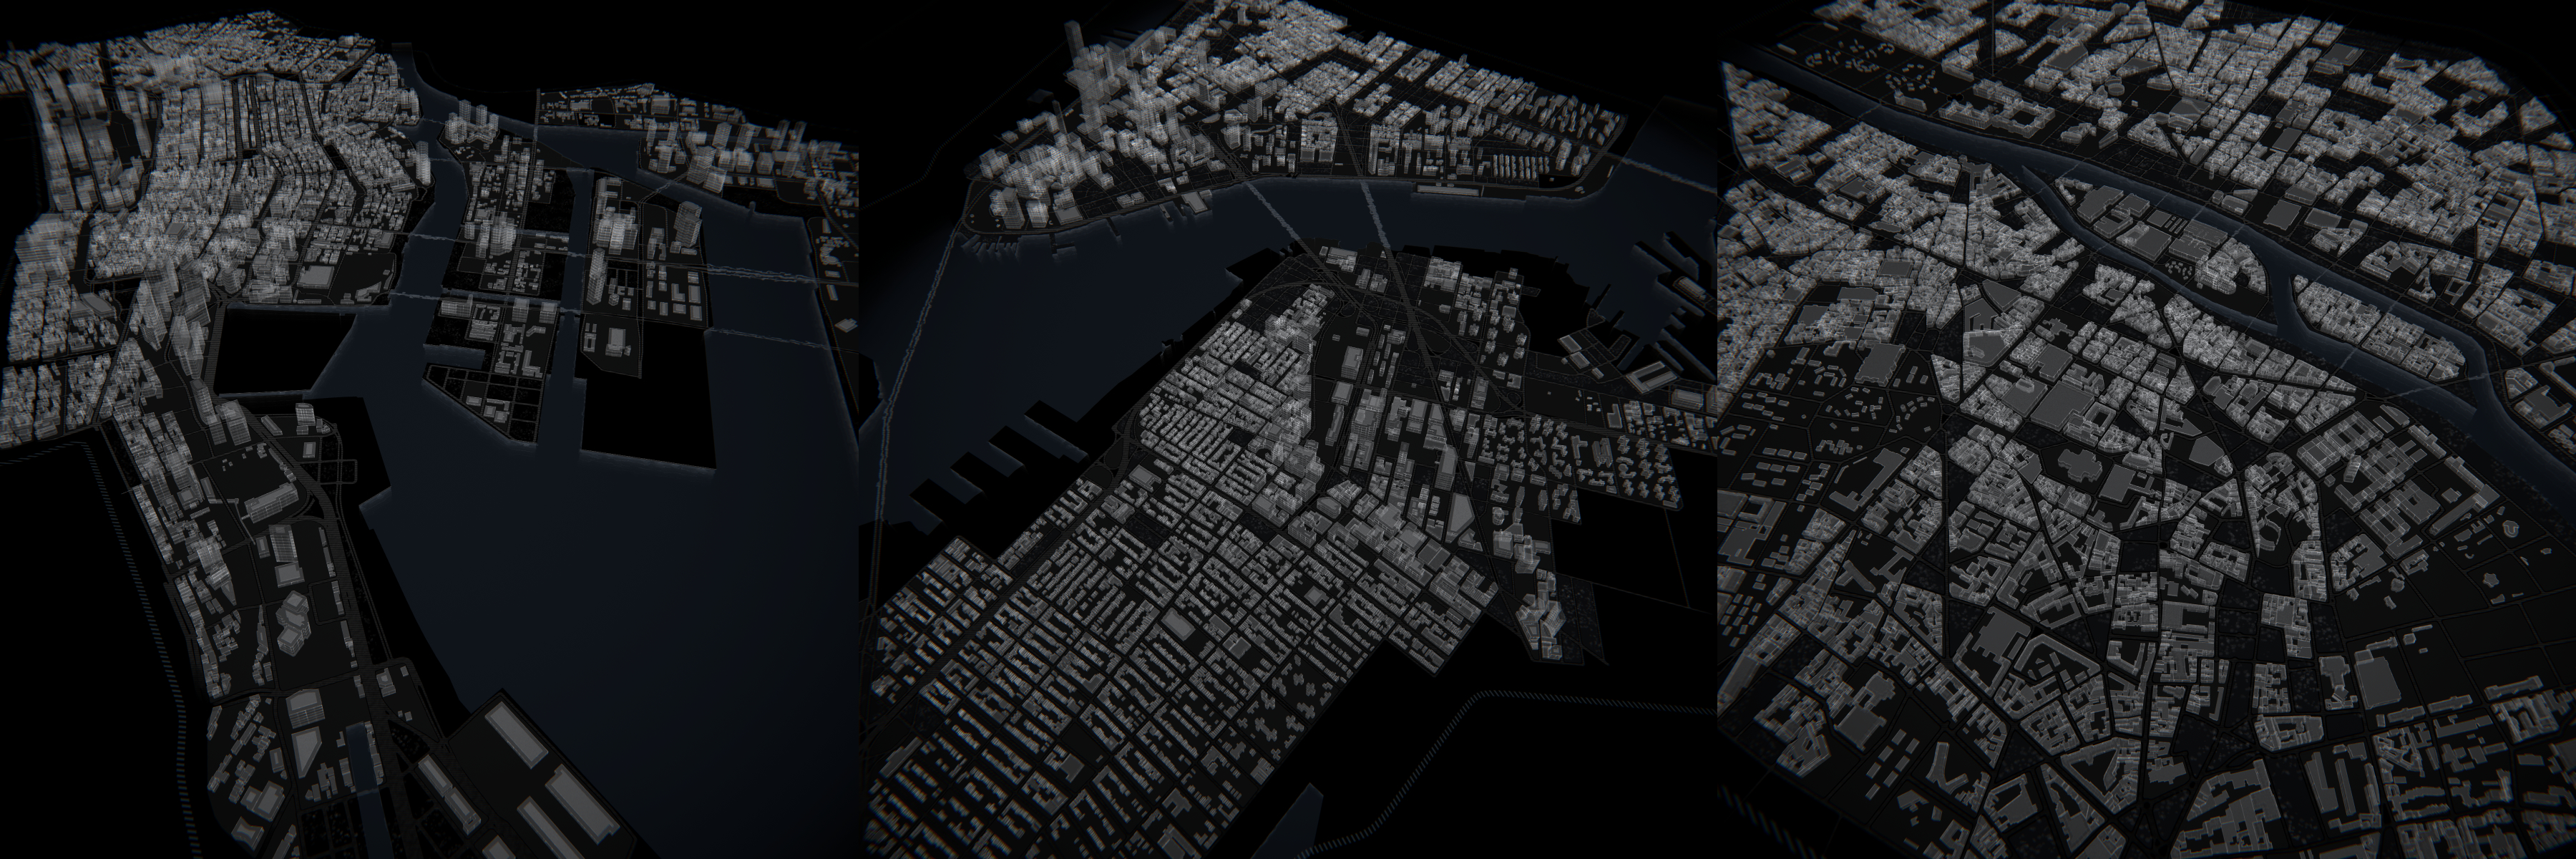 Maps_triptic.jpg